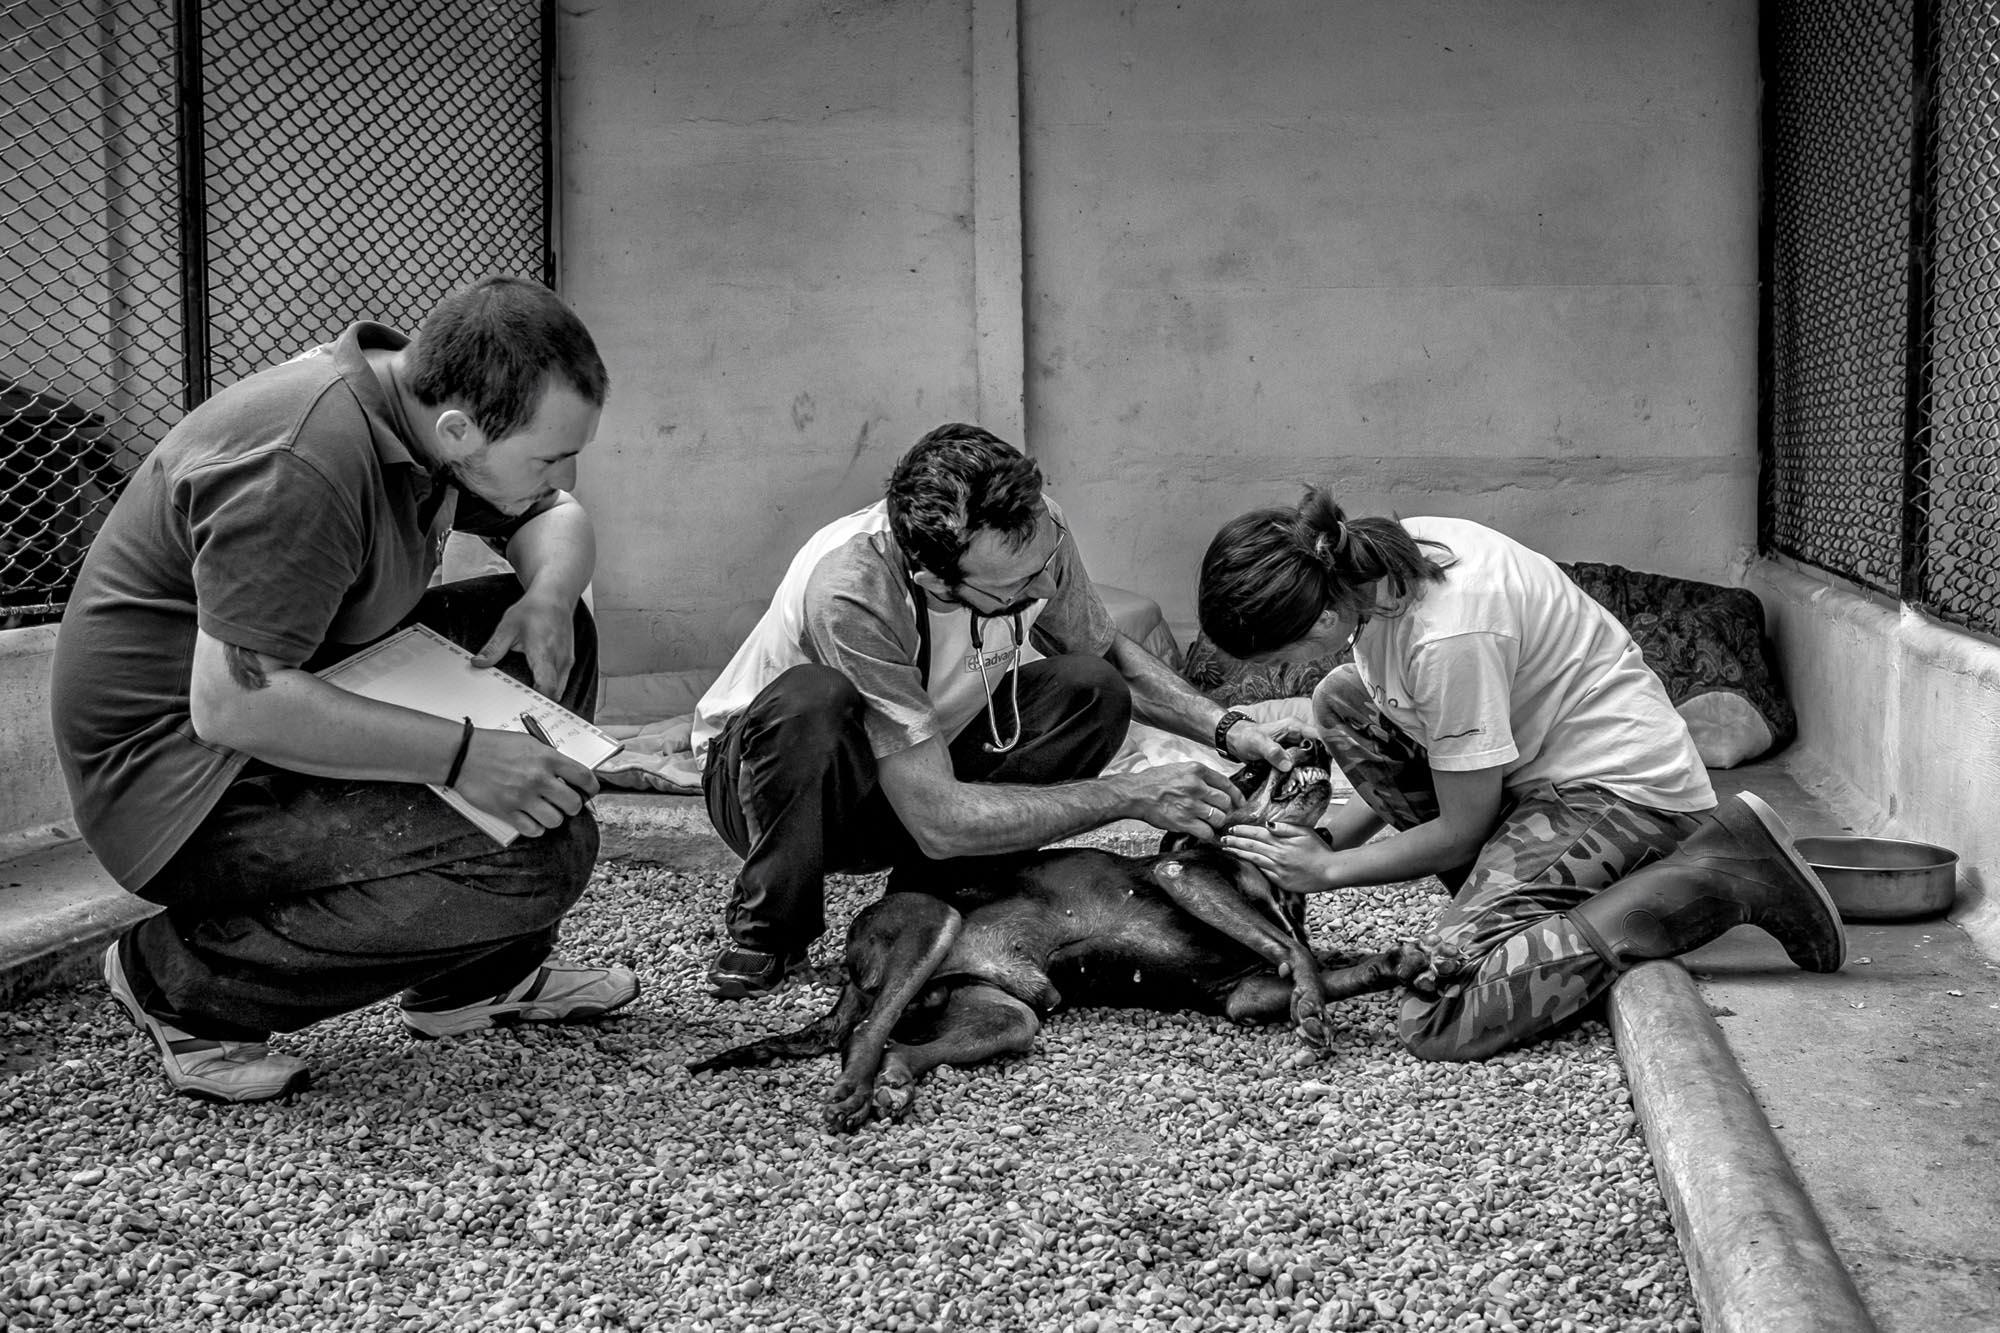 0441 Volontari canile 2 - Canile di Rubano Padova